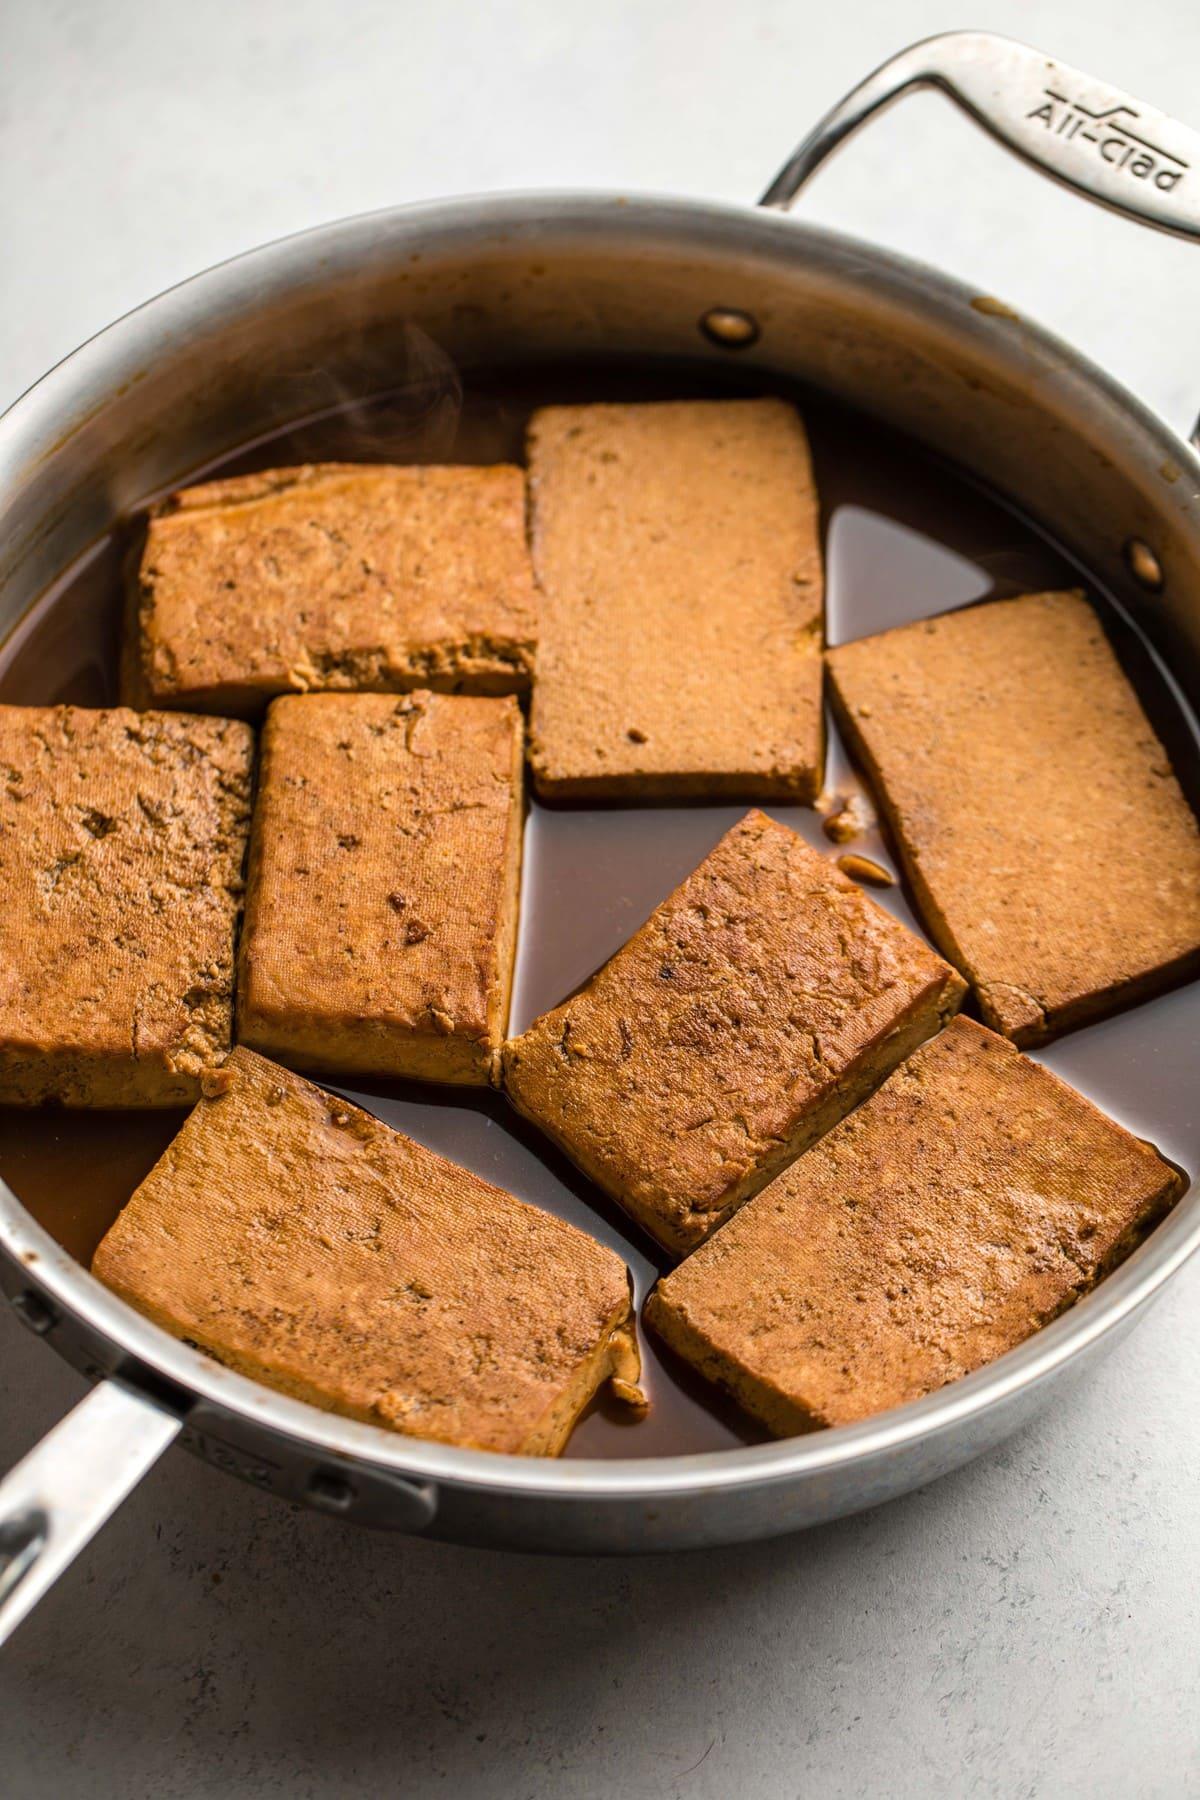 braised tofu in metal pot after baking